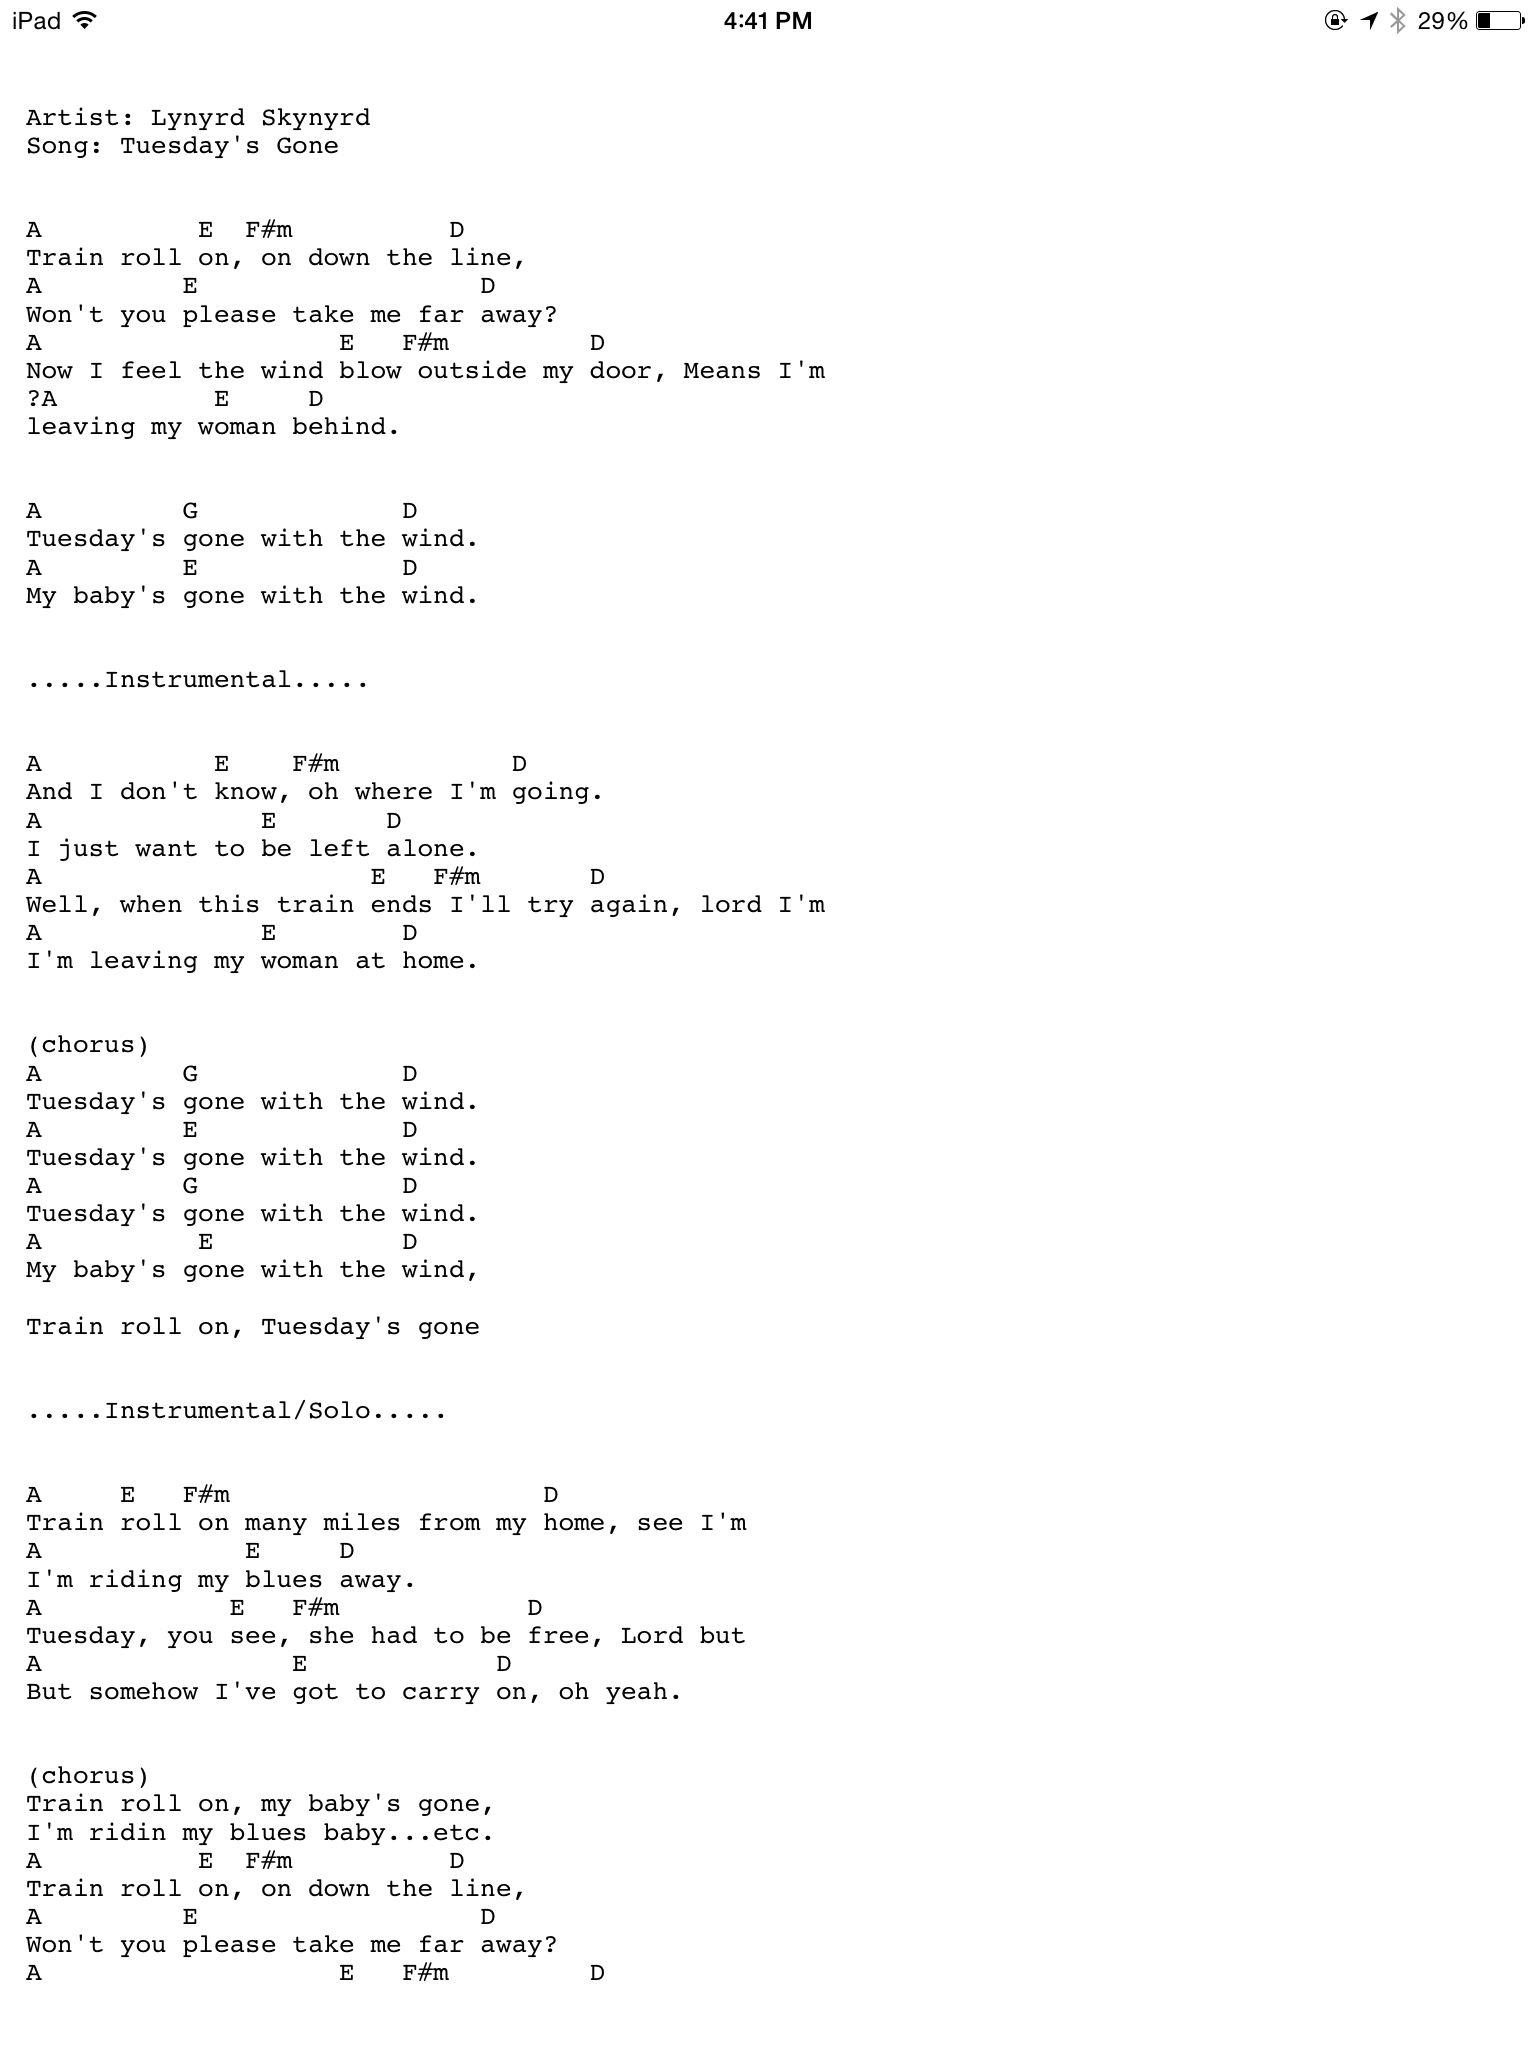 Tuesday's gone Guitar chords and lyrics, Jazz guitar